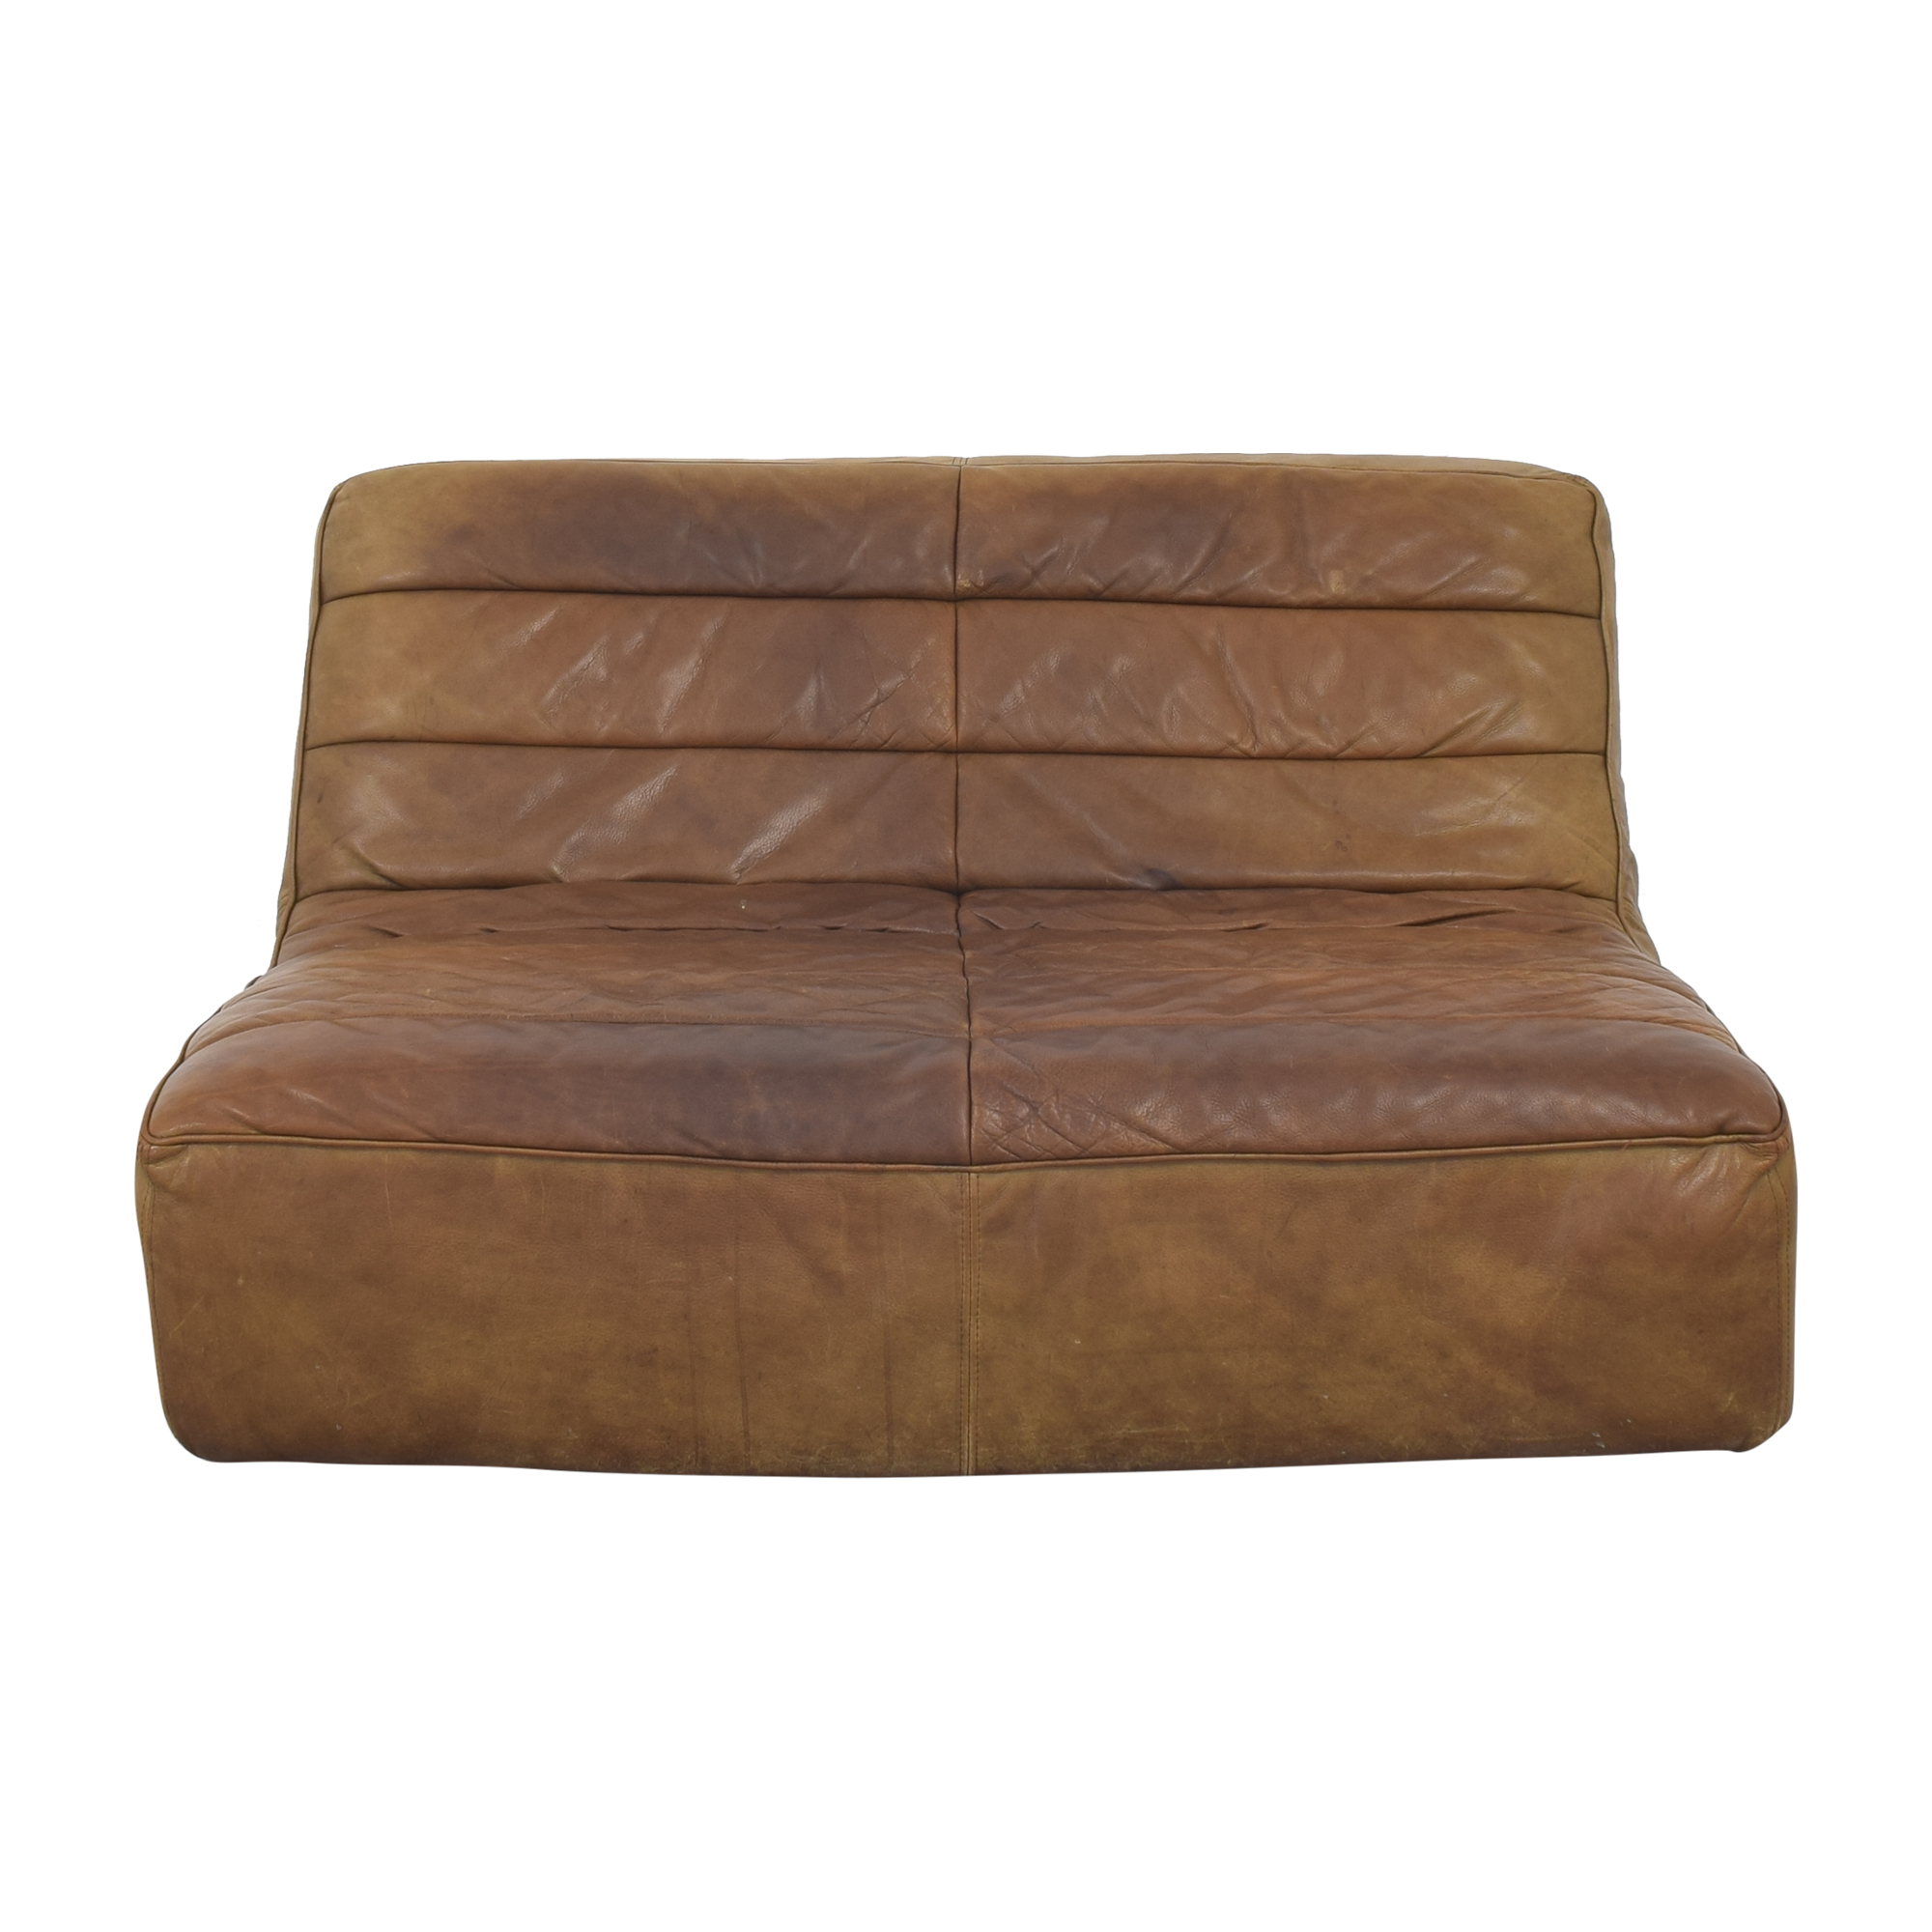 Timothy Oulton Timothy Oulton Shabby 2 Seater Sofa ma